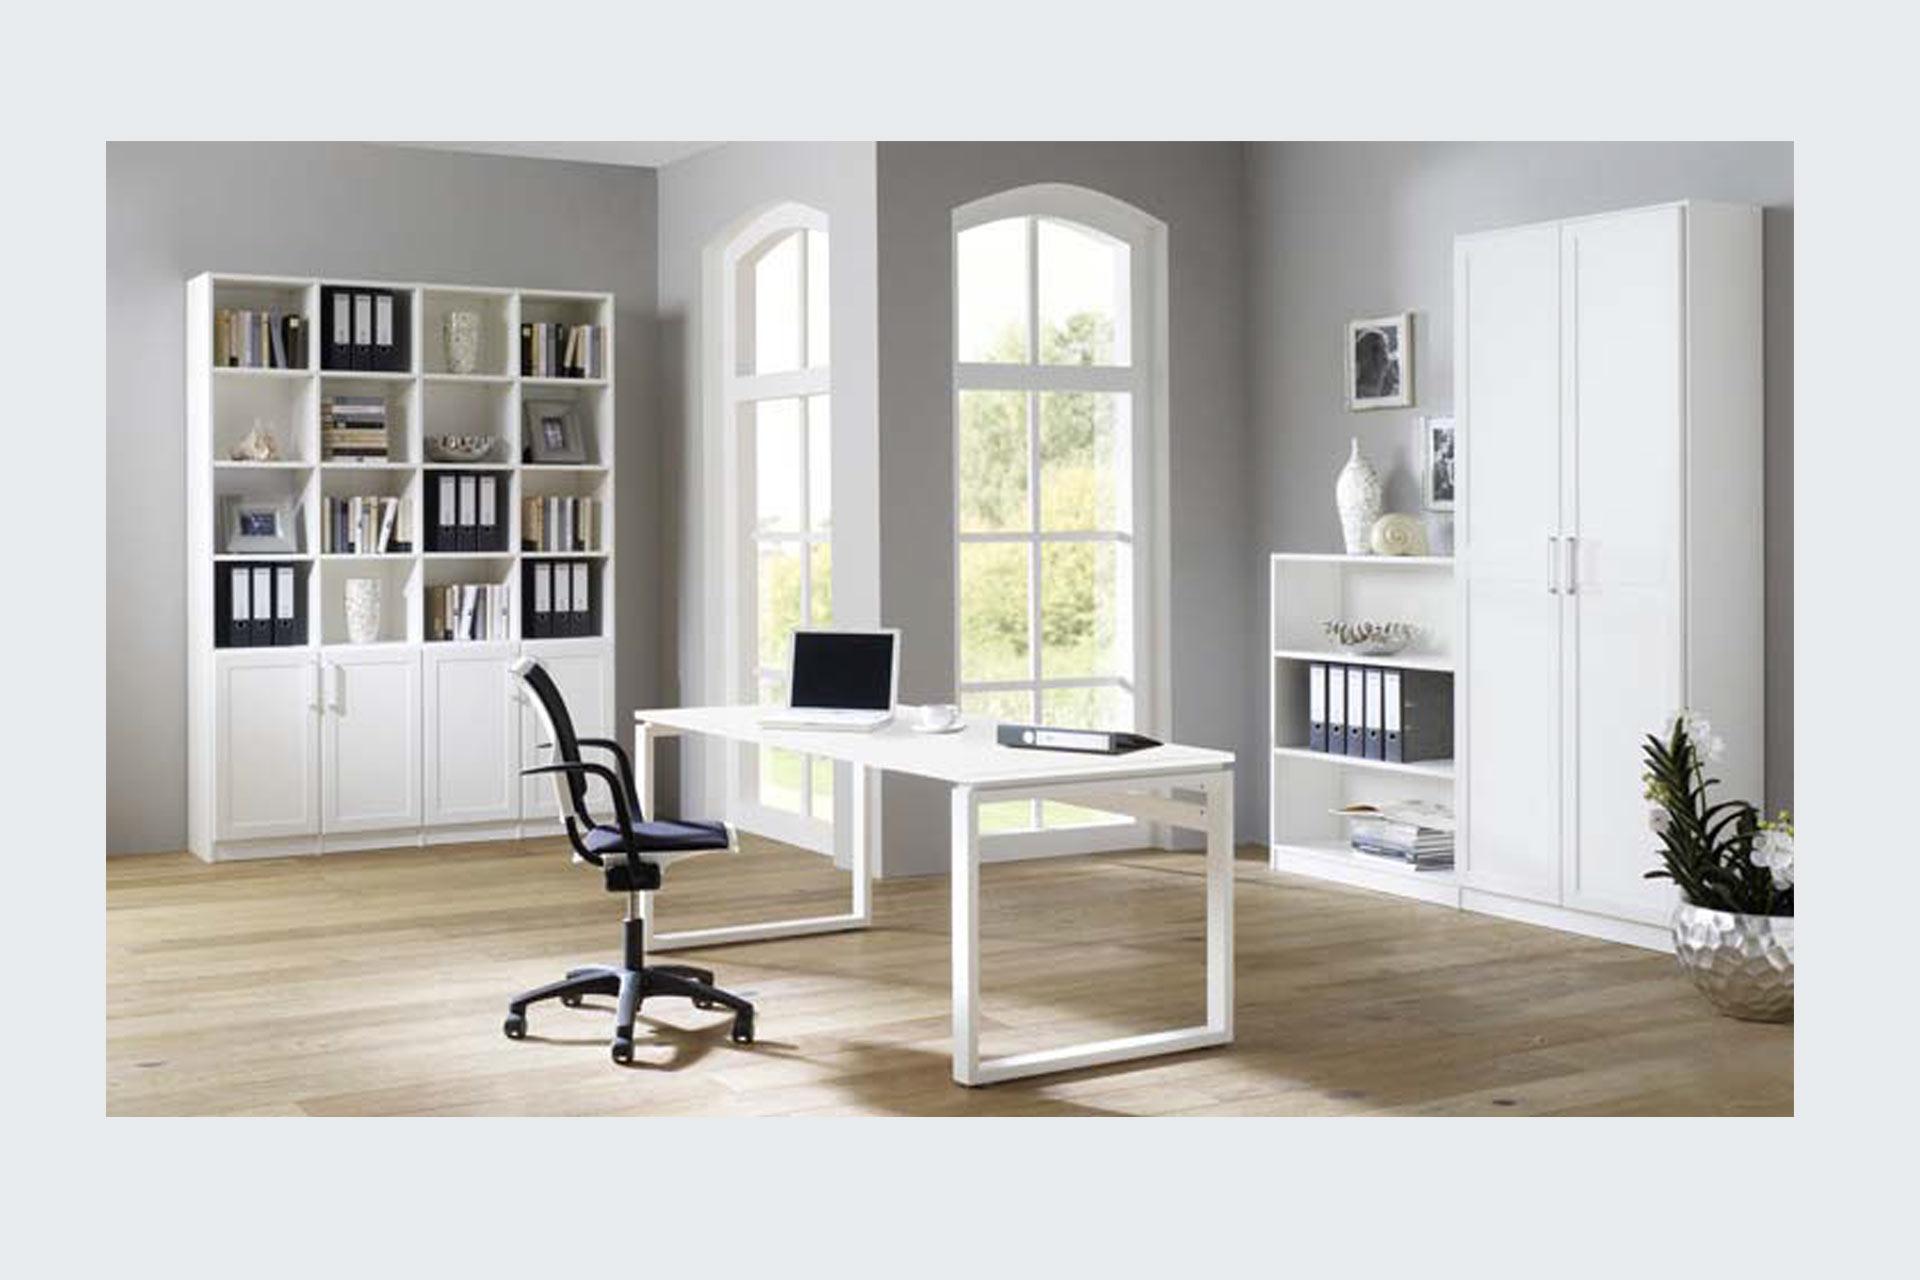 schreibtisch qubu weiss lackiert wohnopposition berlin. Black Bedroom Furniture Sets. Home Design Ideas